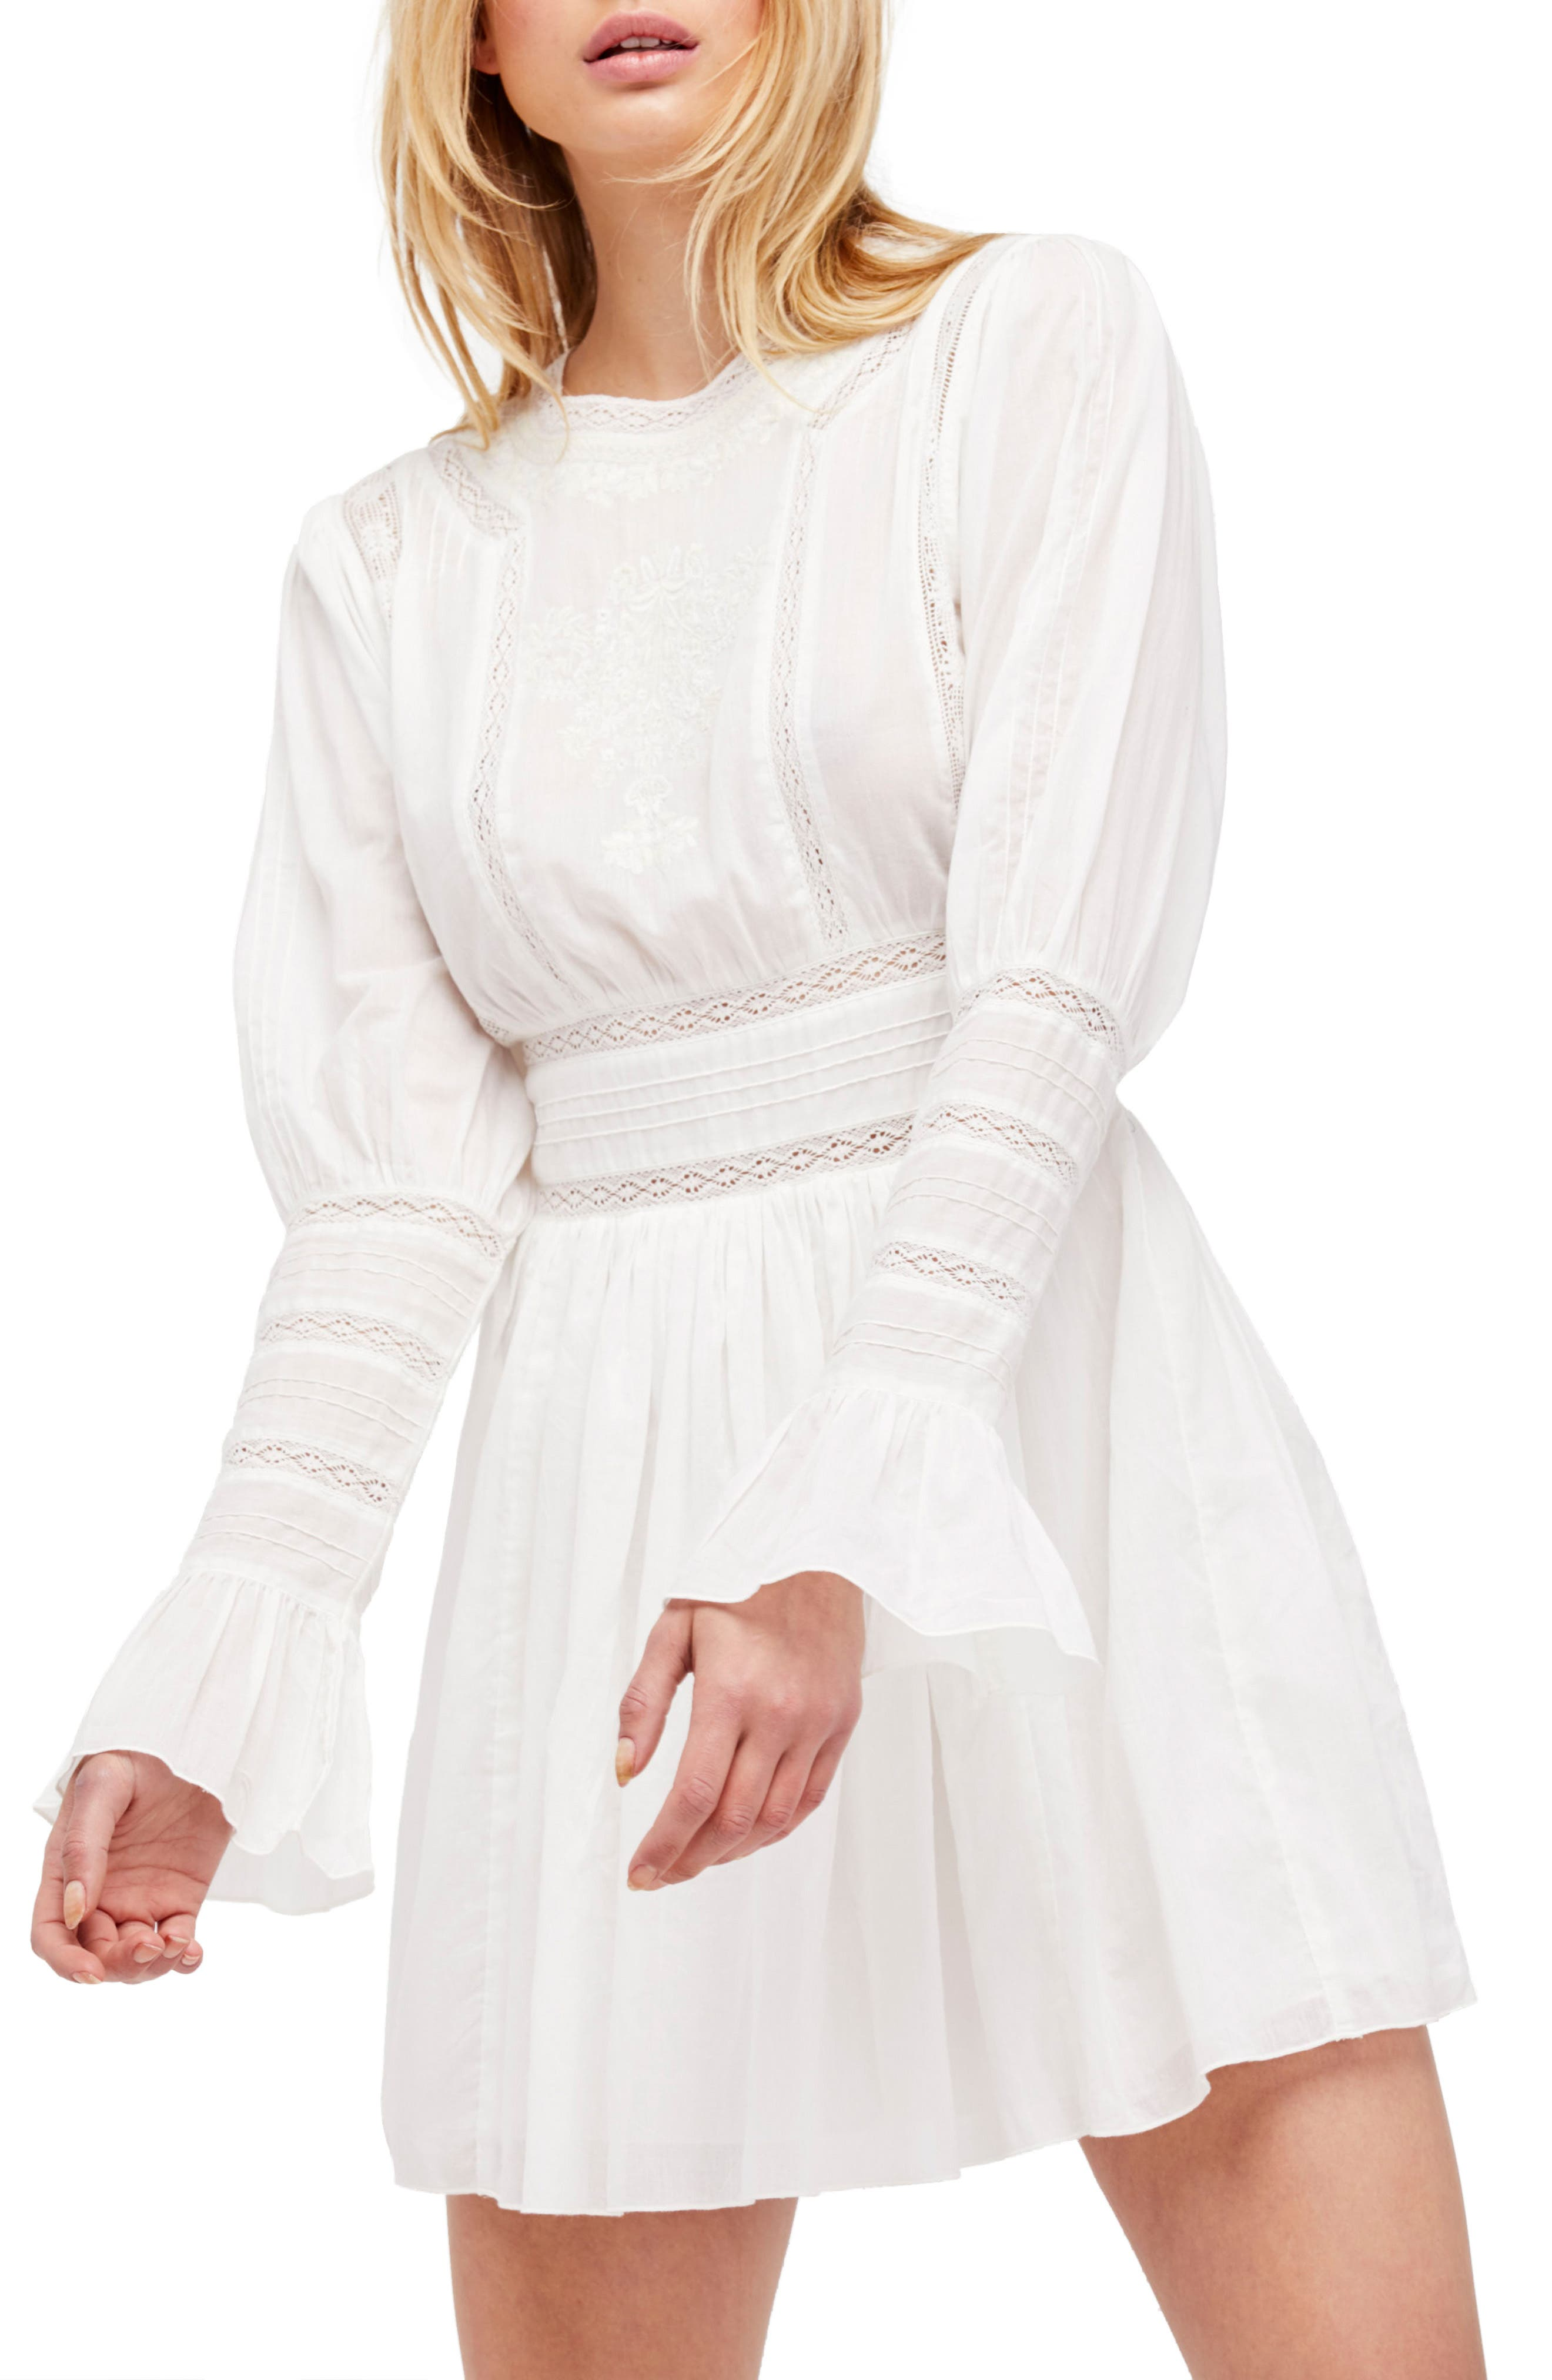 Free People Victorian Minidress